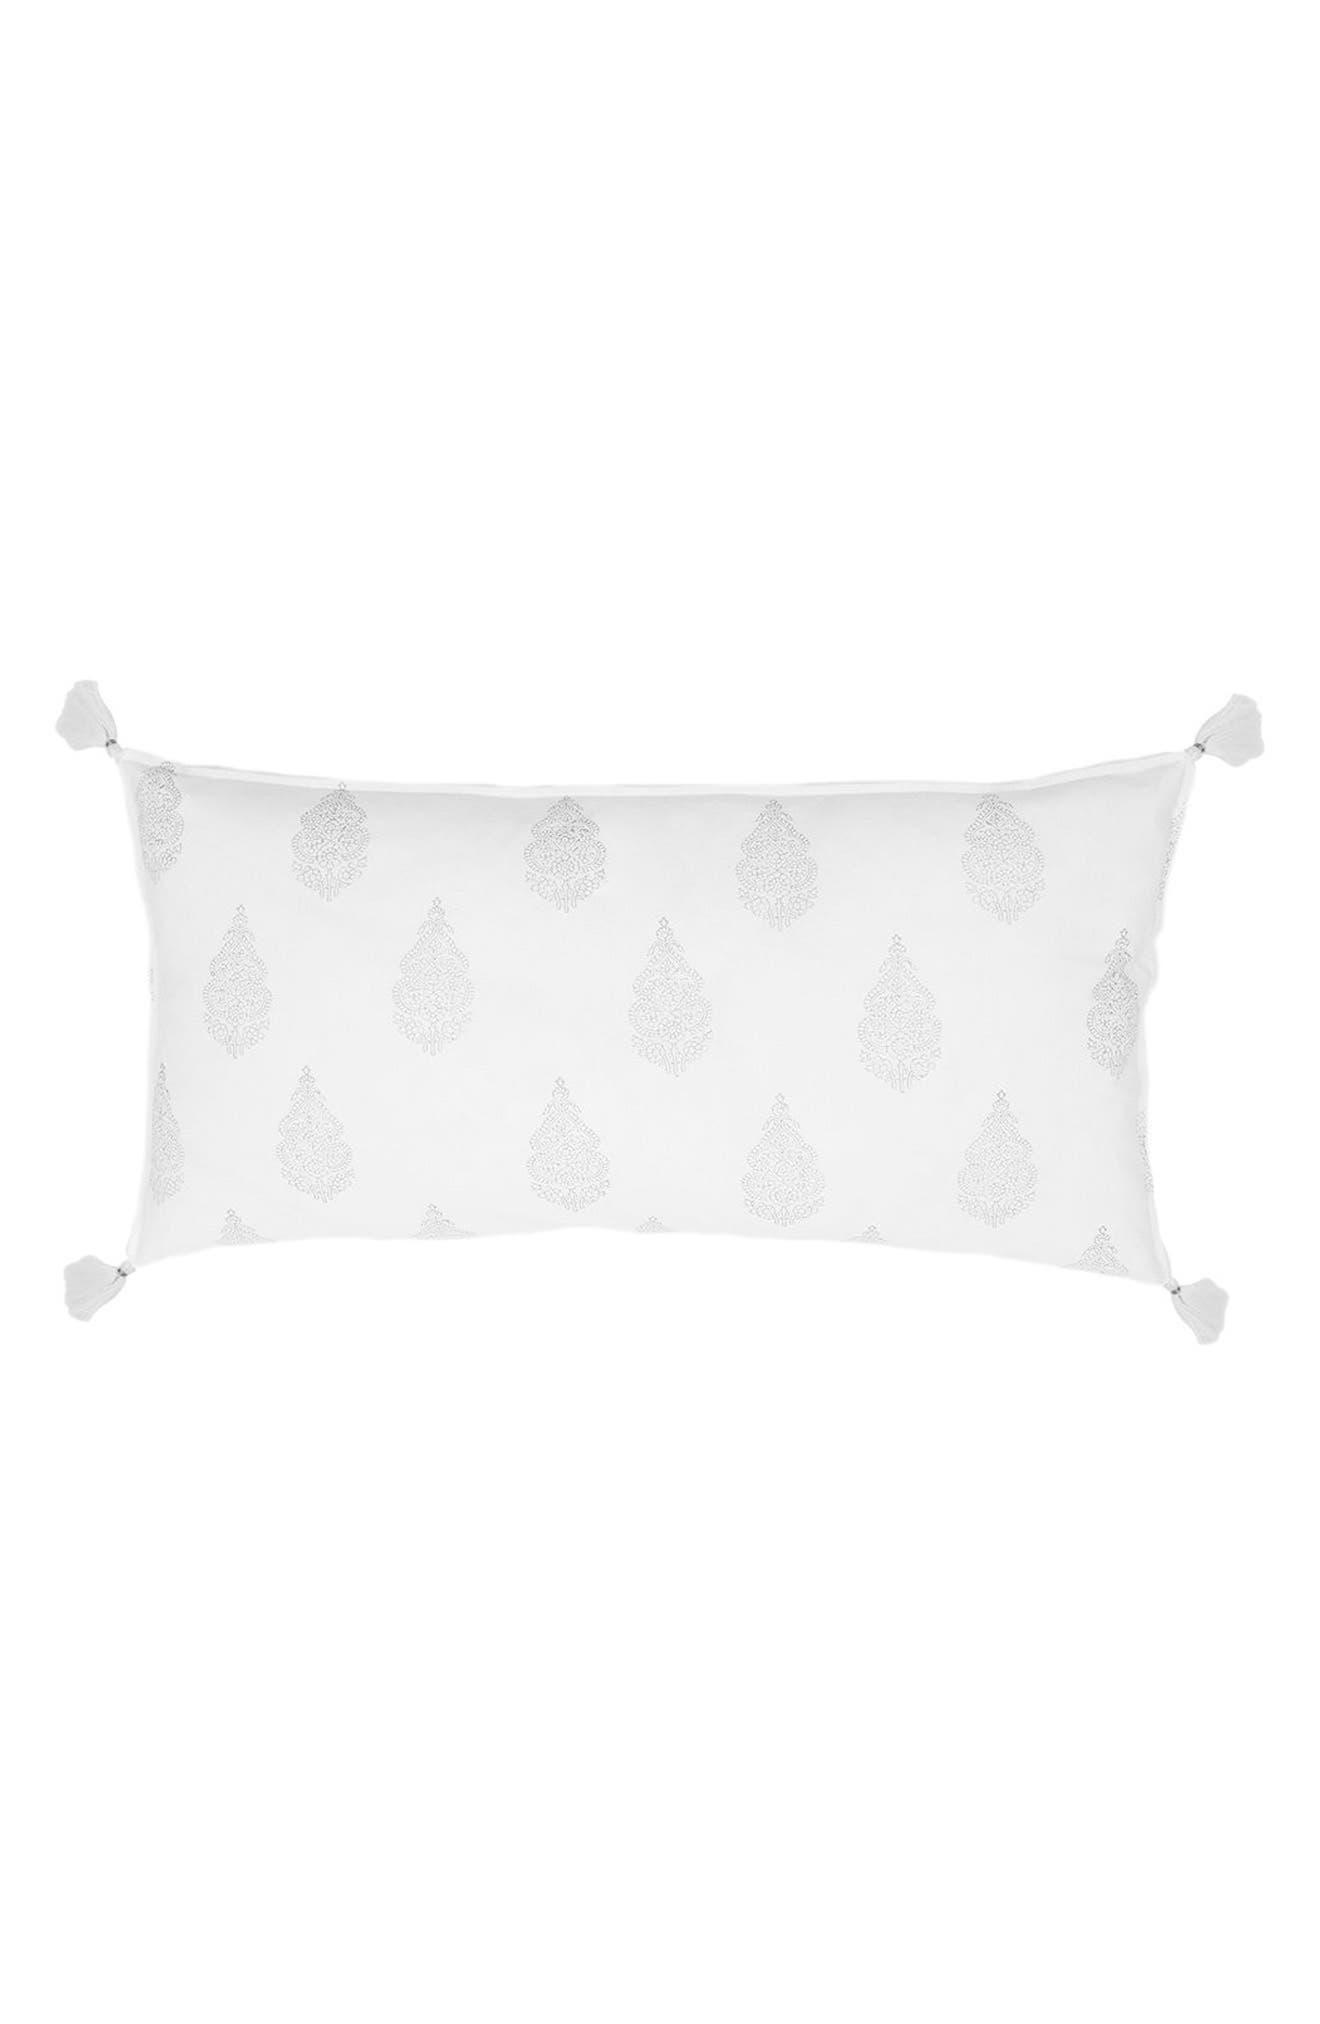 Siya Accent Pillow,                         Main,                         color, 040